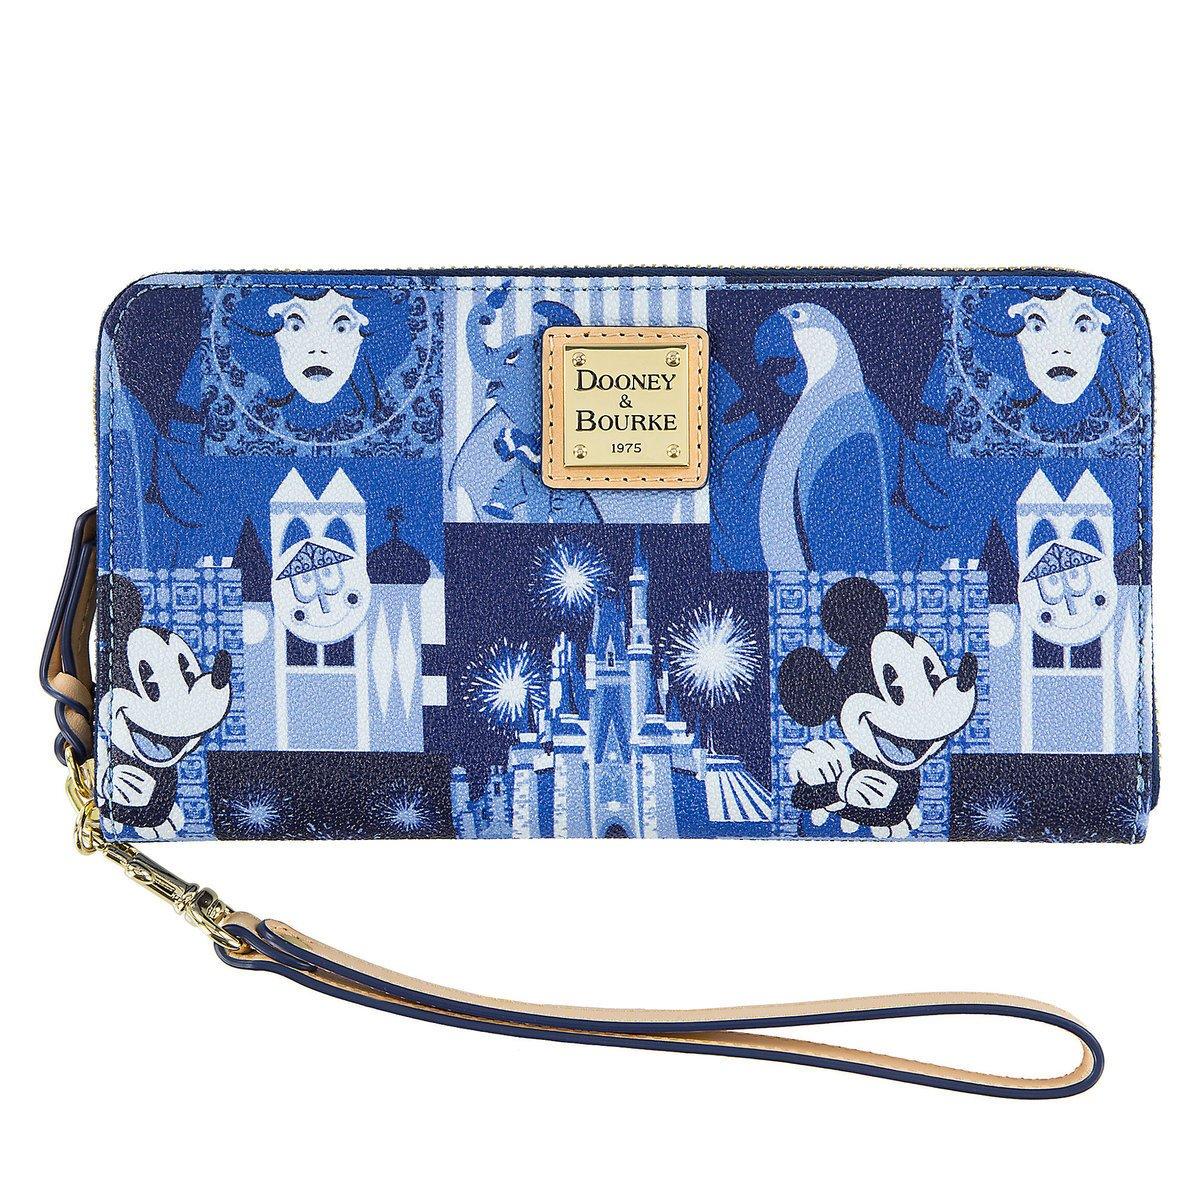 Disney Dooney & Bourke Wallet Wristlet Magic Kingdom 45th Anniversary Bag Purse